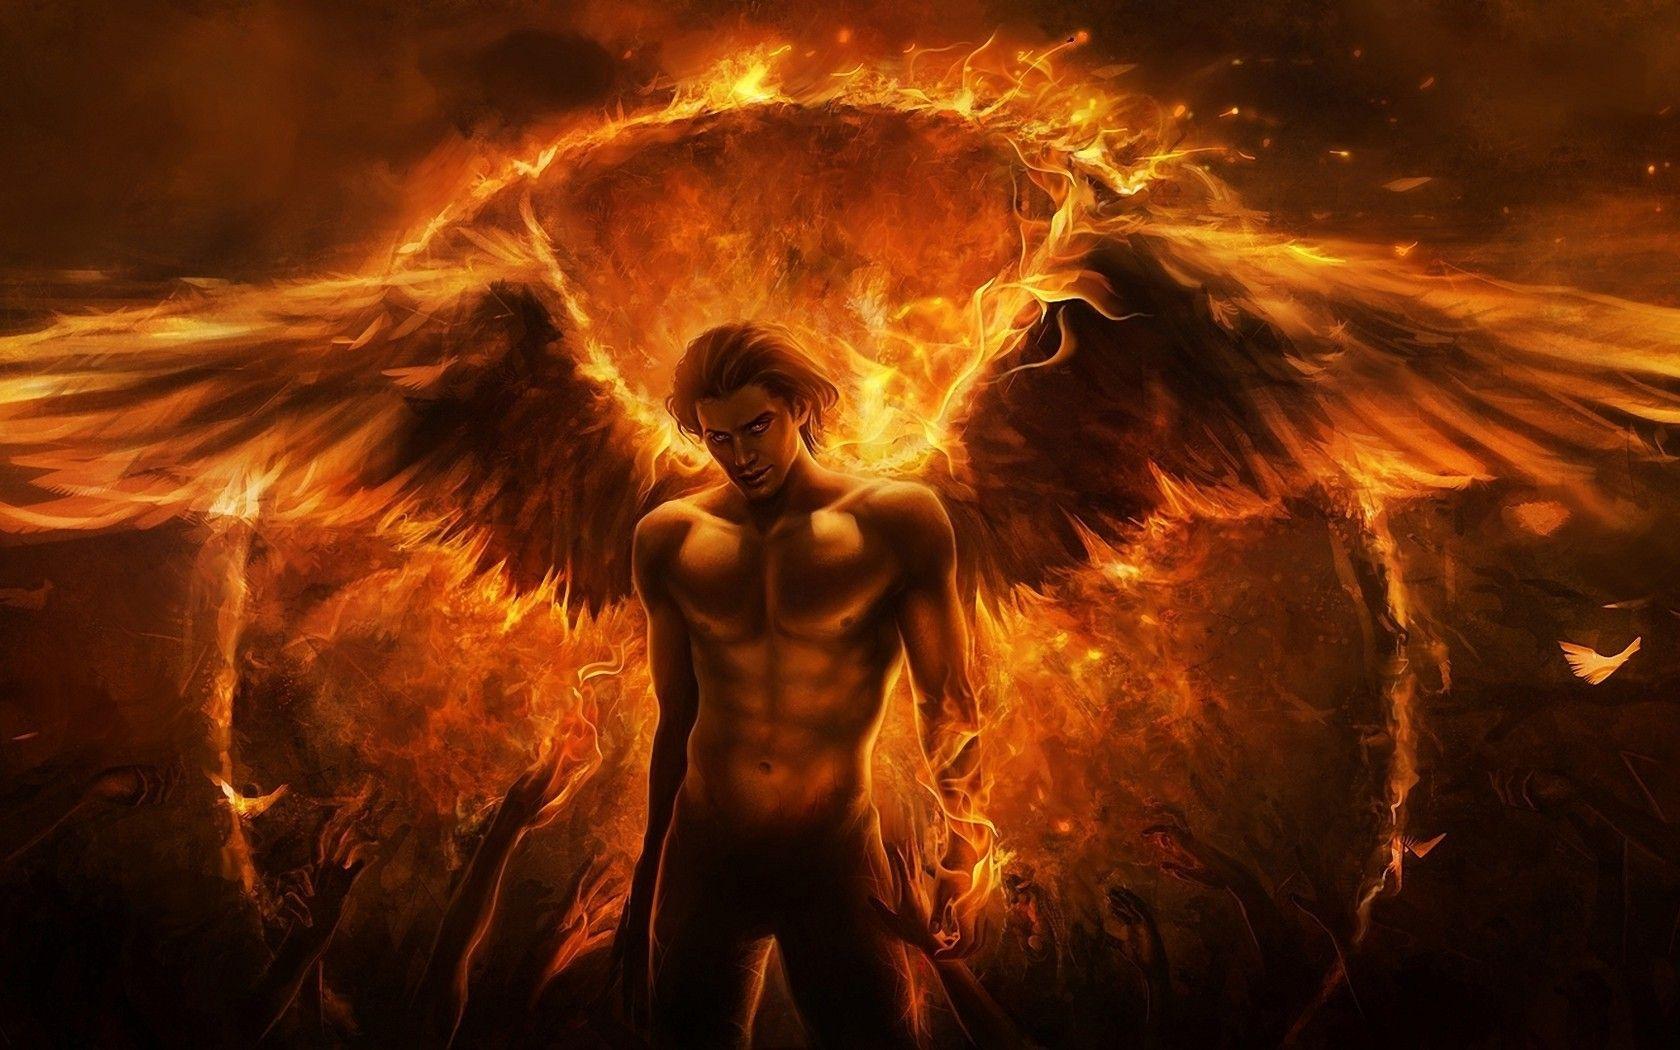 Bildergebnis für the devil ascending from kilauea huge fire lake images